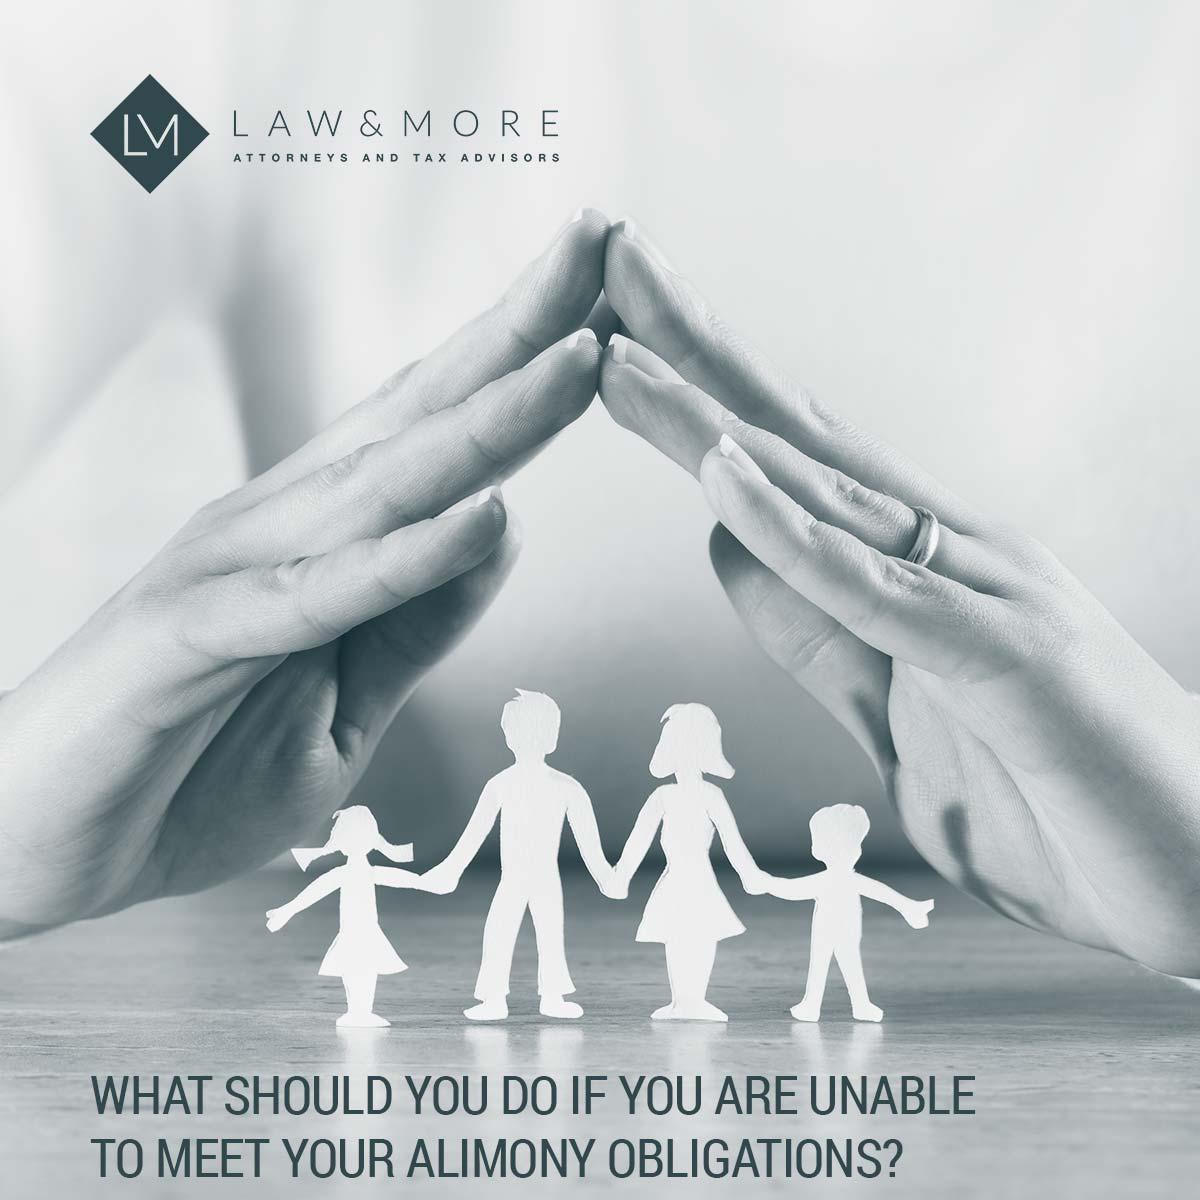 Apa yang harus Anda lakukan jika Anda tidak dapat memenuhi kewajiban tunjangan Anda? Gambar